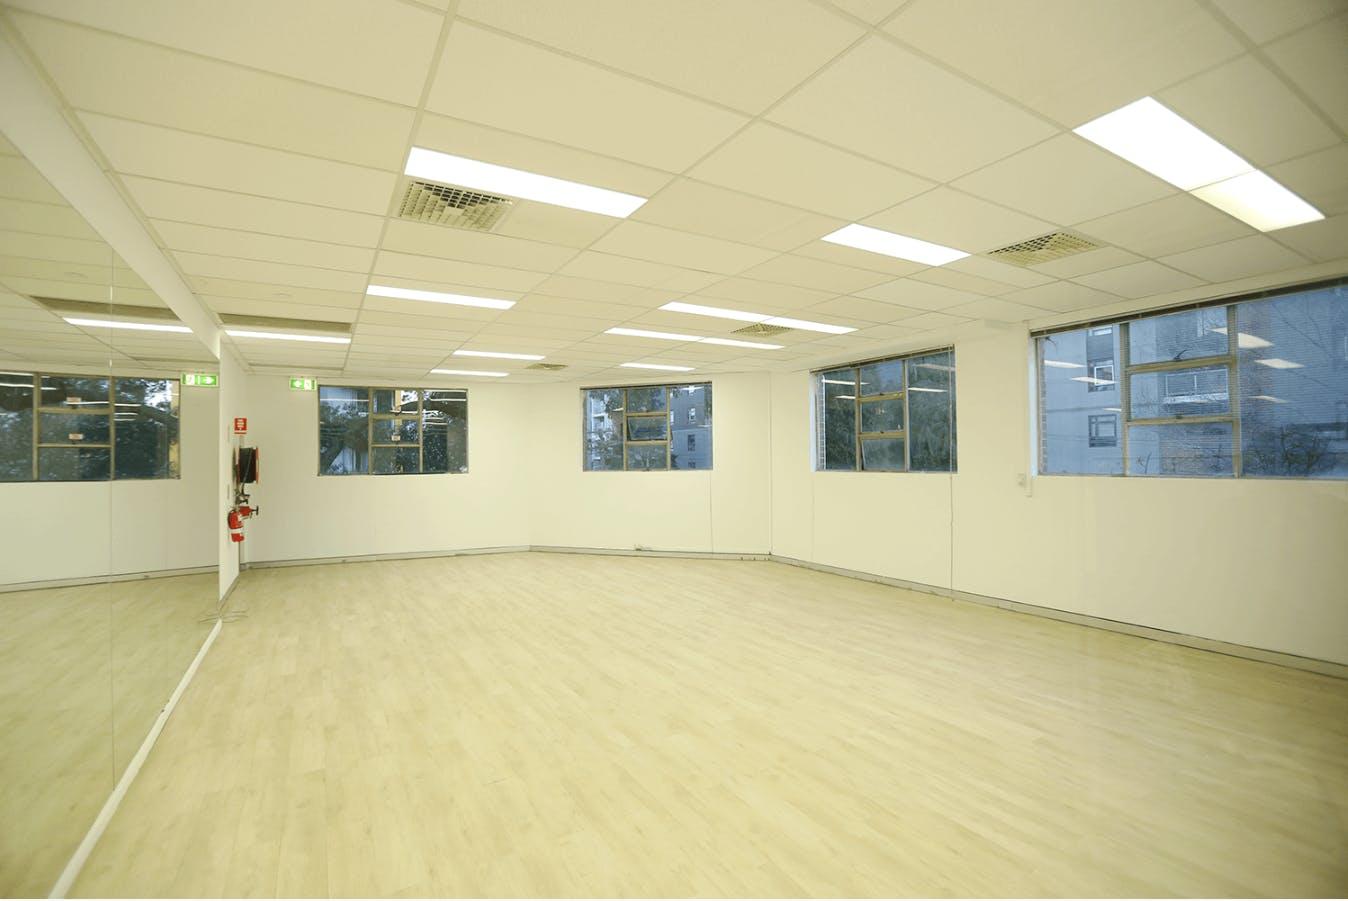 Luky Dance Studio, creative studio at Luky Studio, image 1